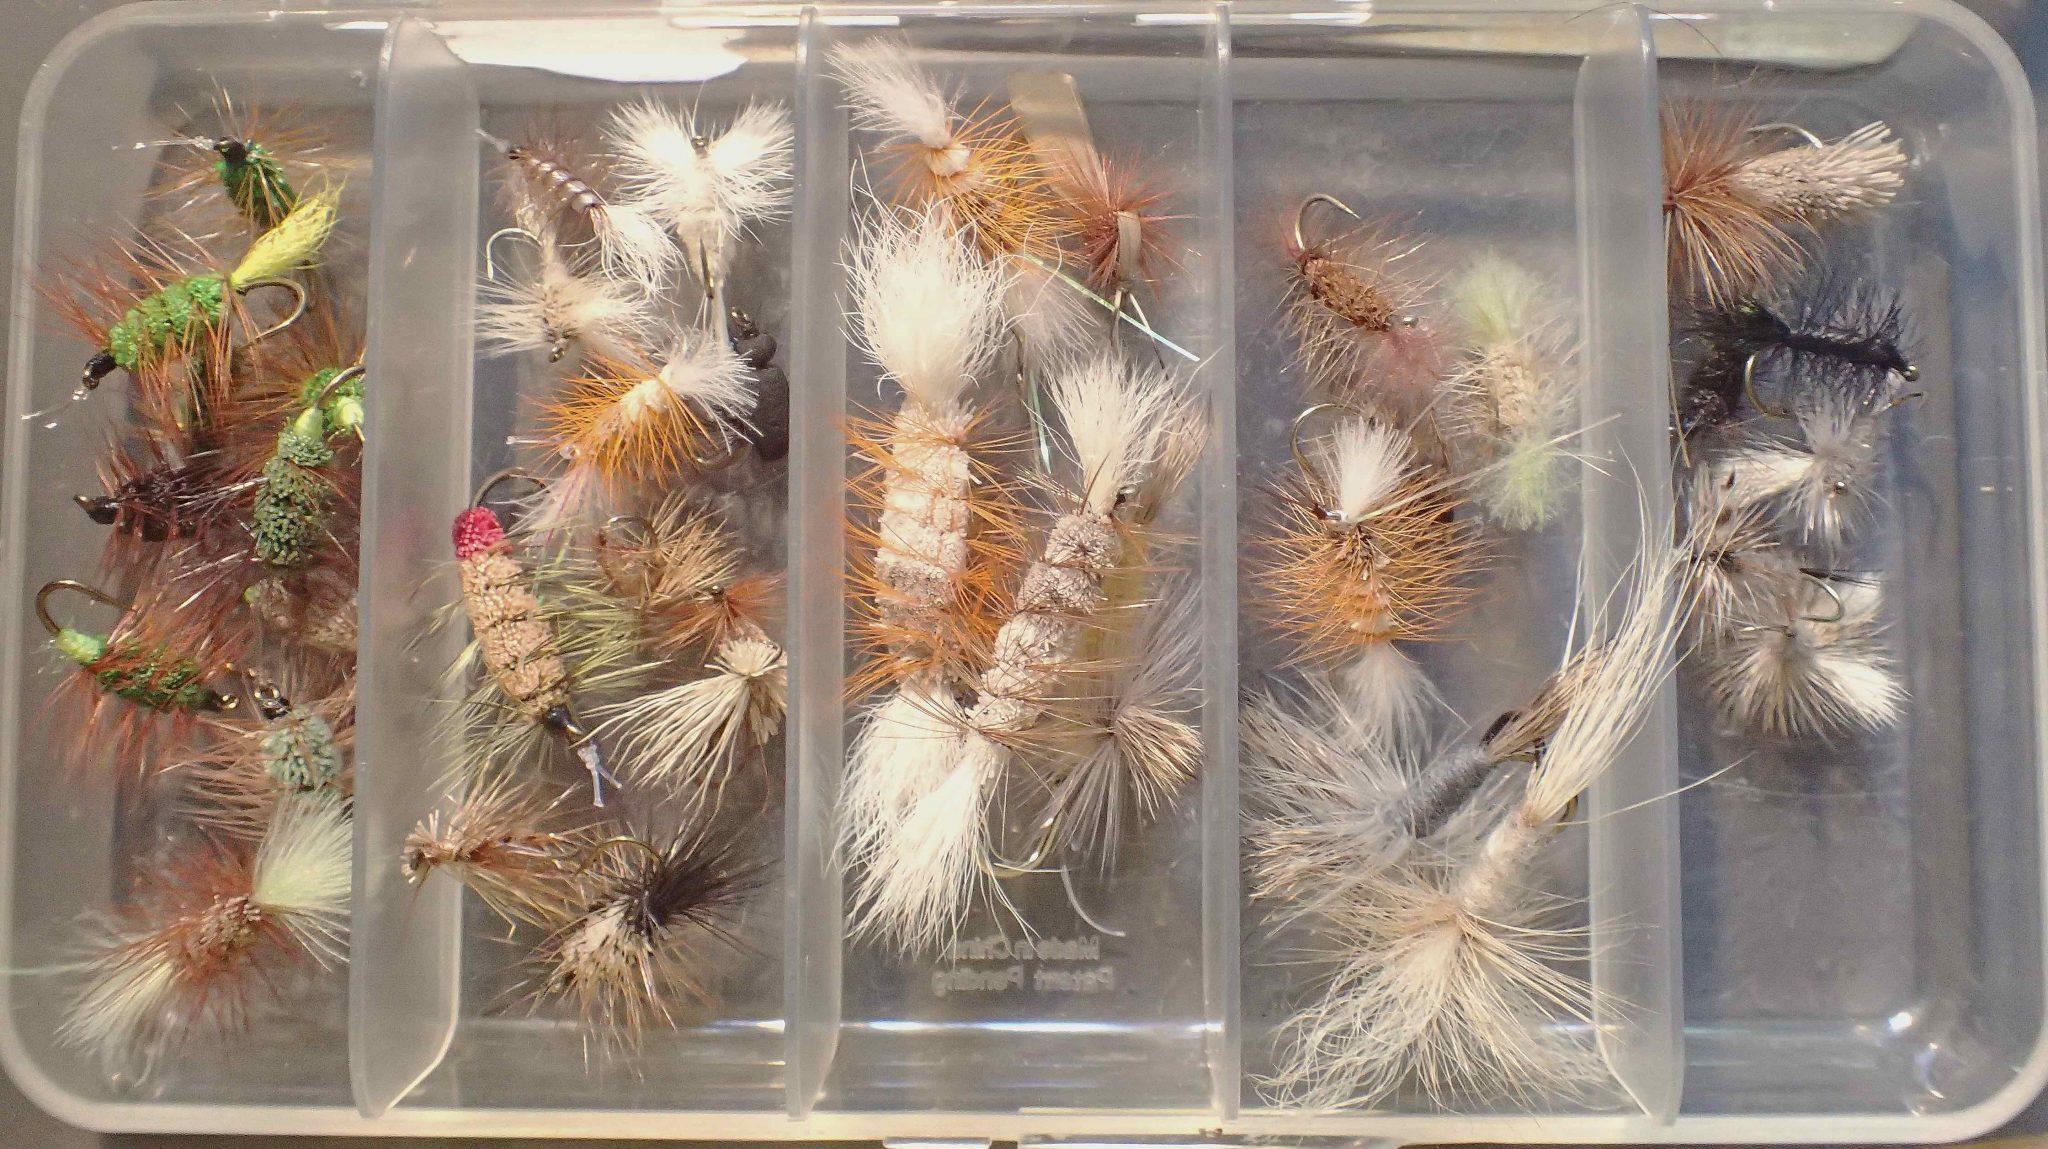 Small Salmon Dry Flies